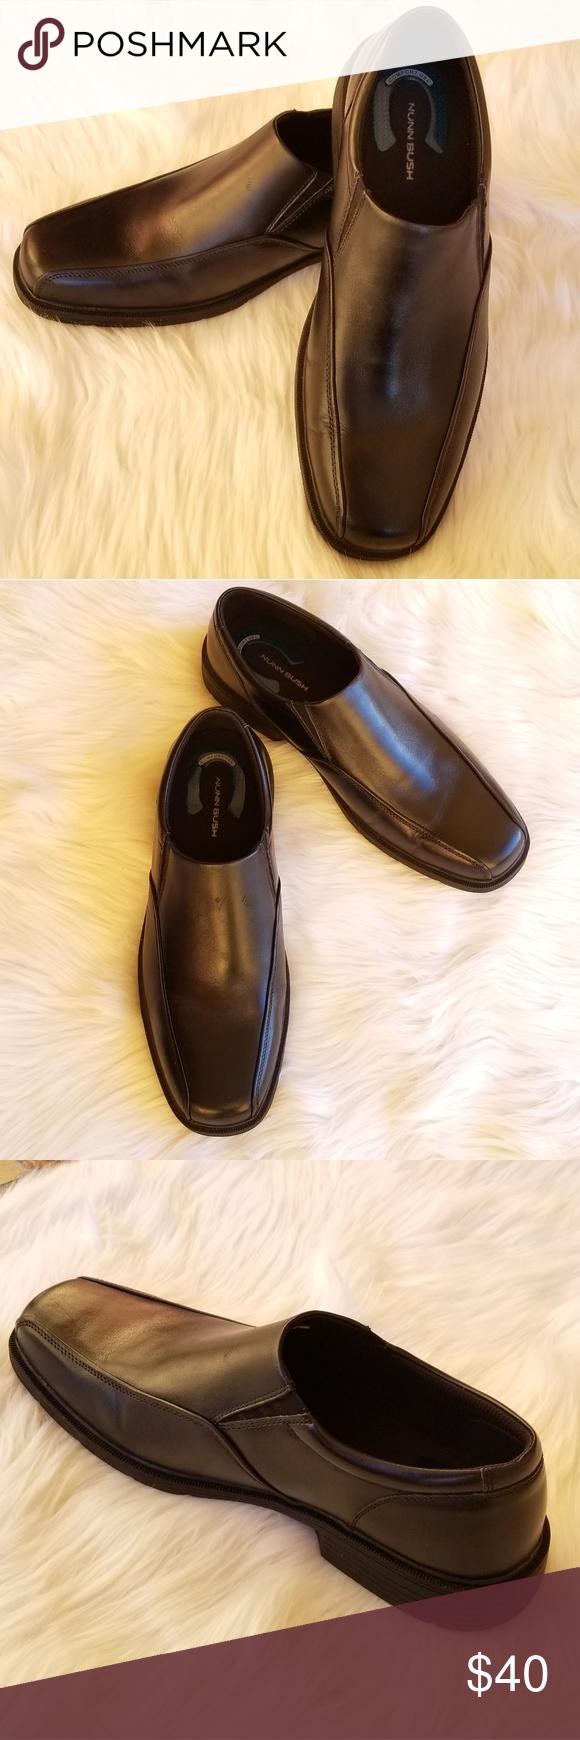 Nunn Bush men's black leather loafers